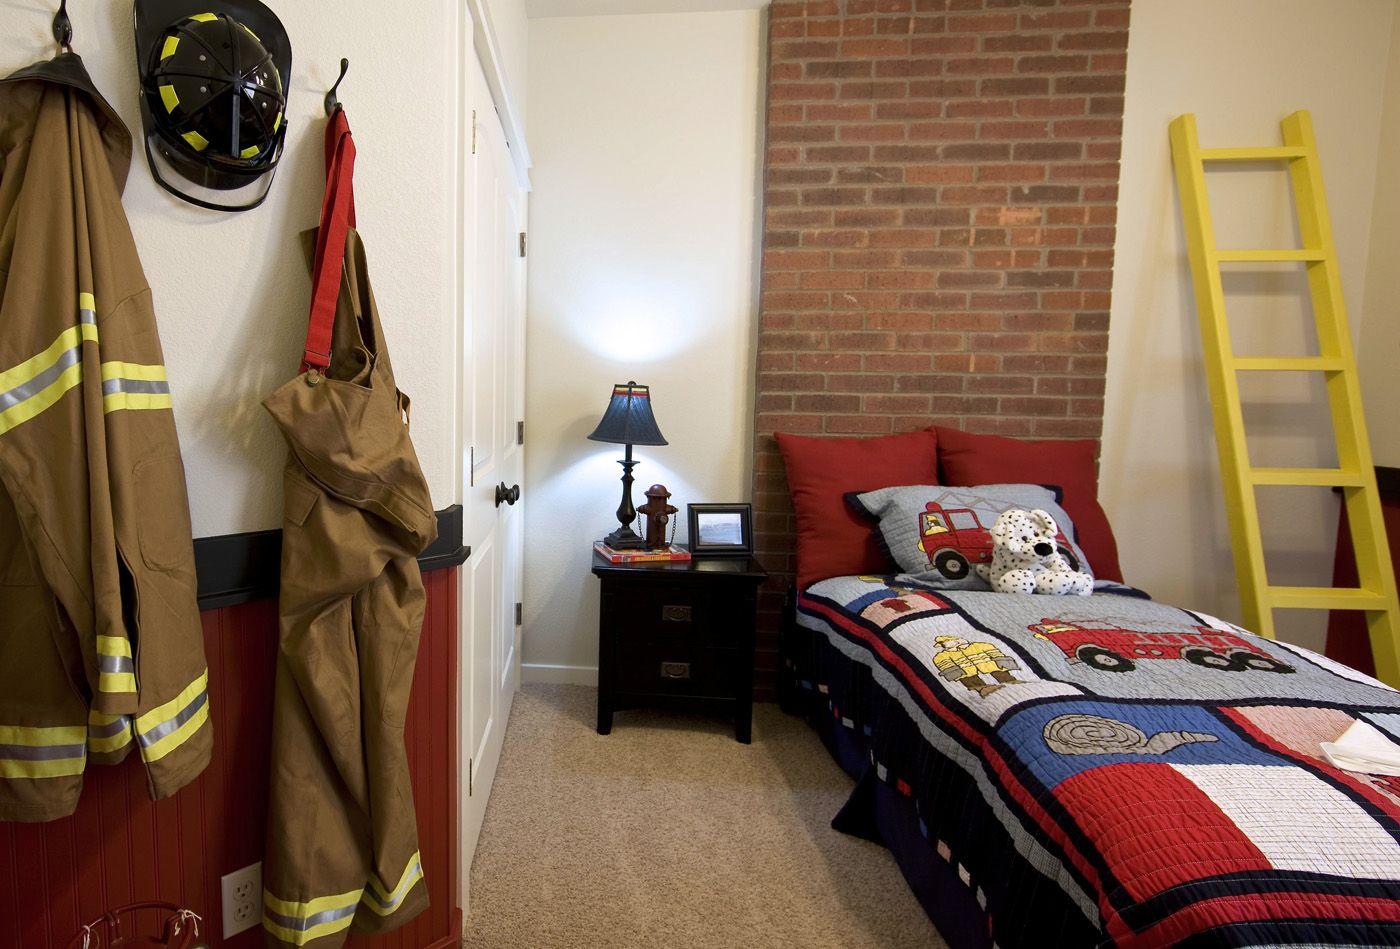 Fireman Hat, Coat And Pants Hung Up. Love That Idea